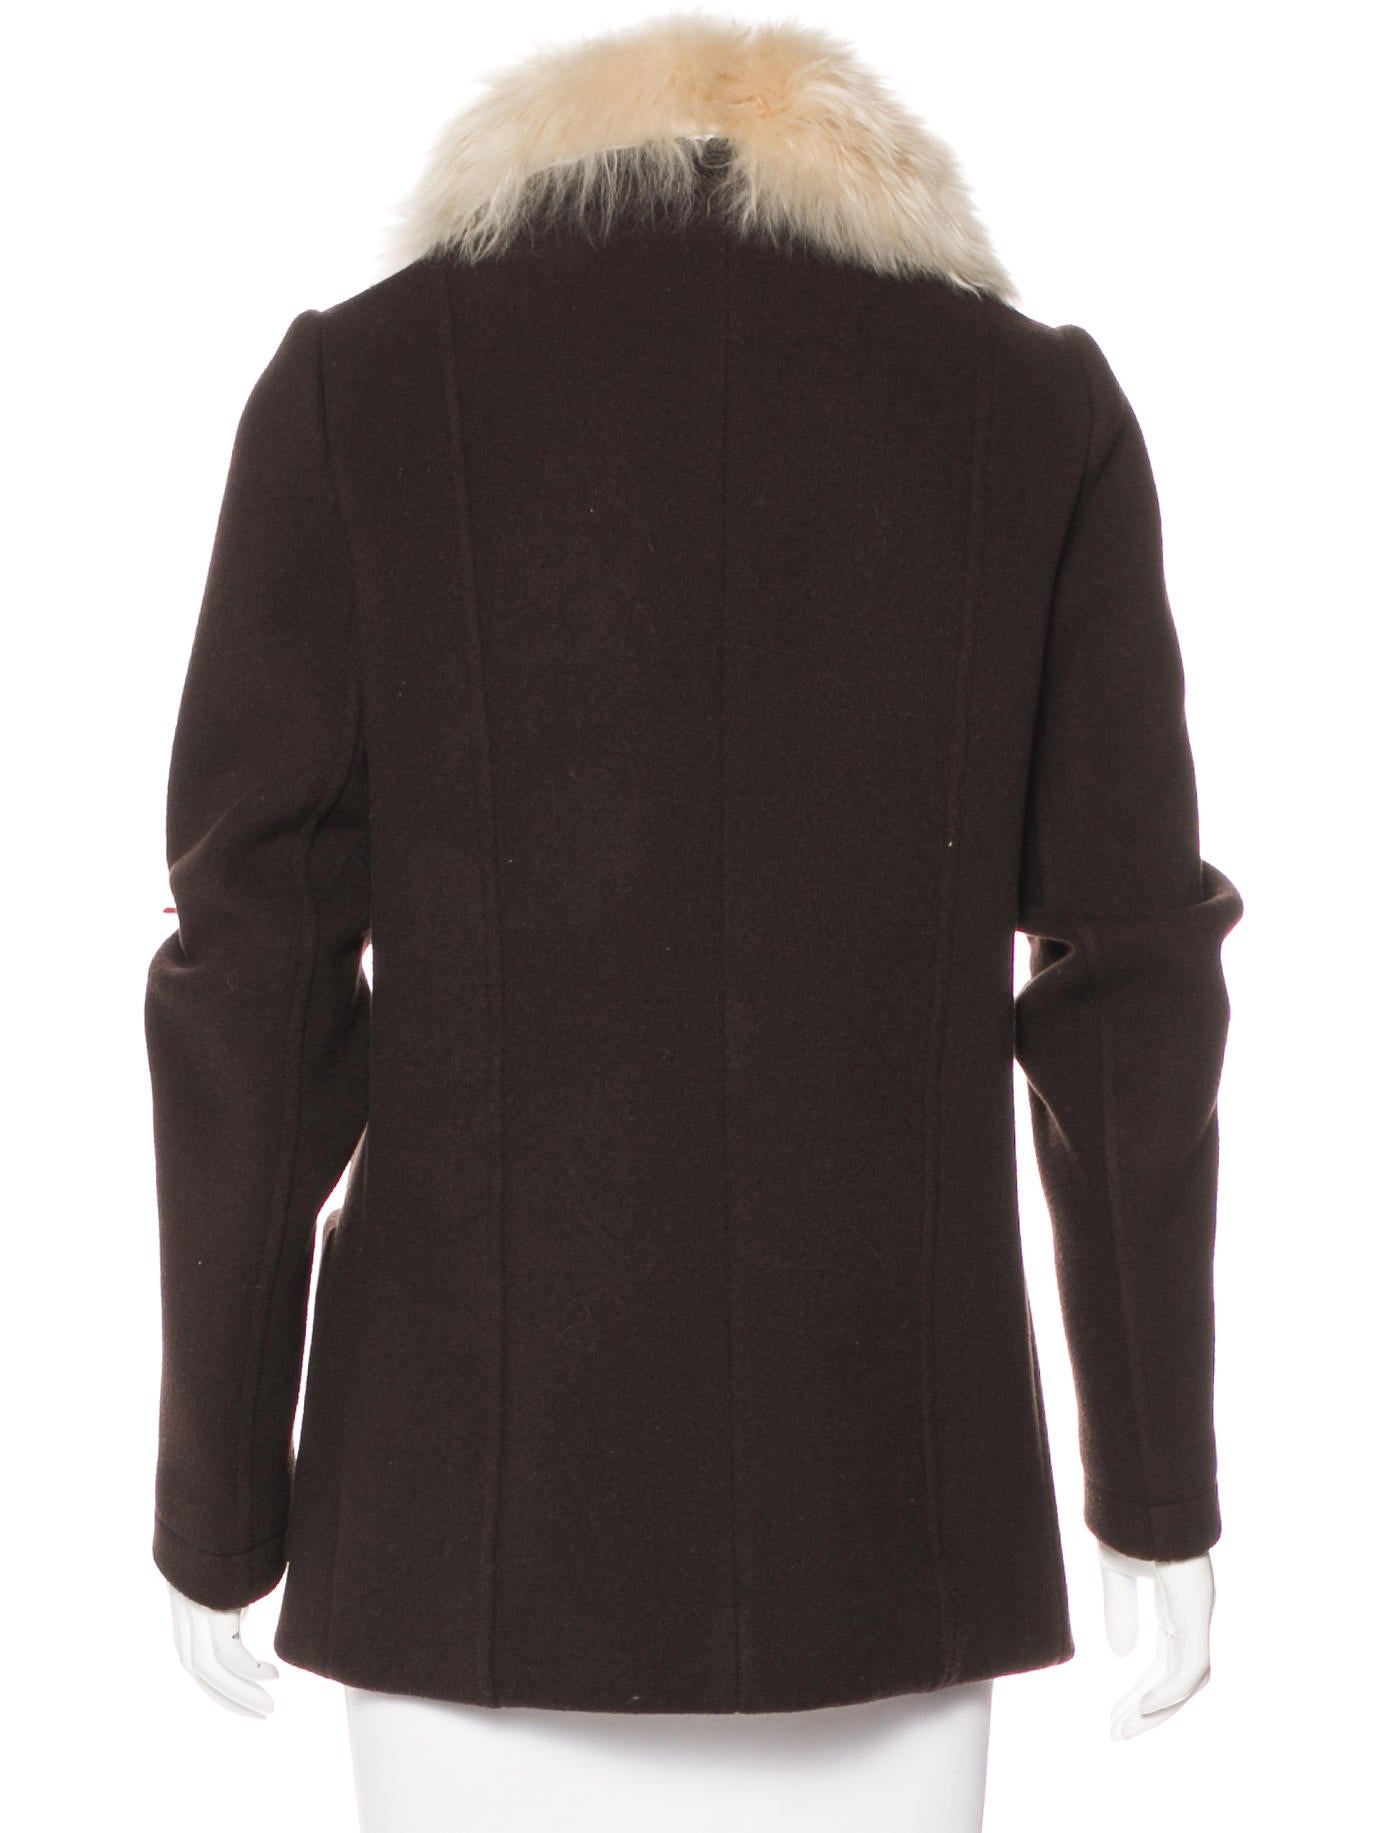 Balenciaga Fur Trimmed Wool Jacket Clothing Bal56394